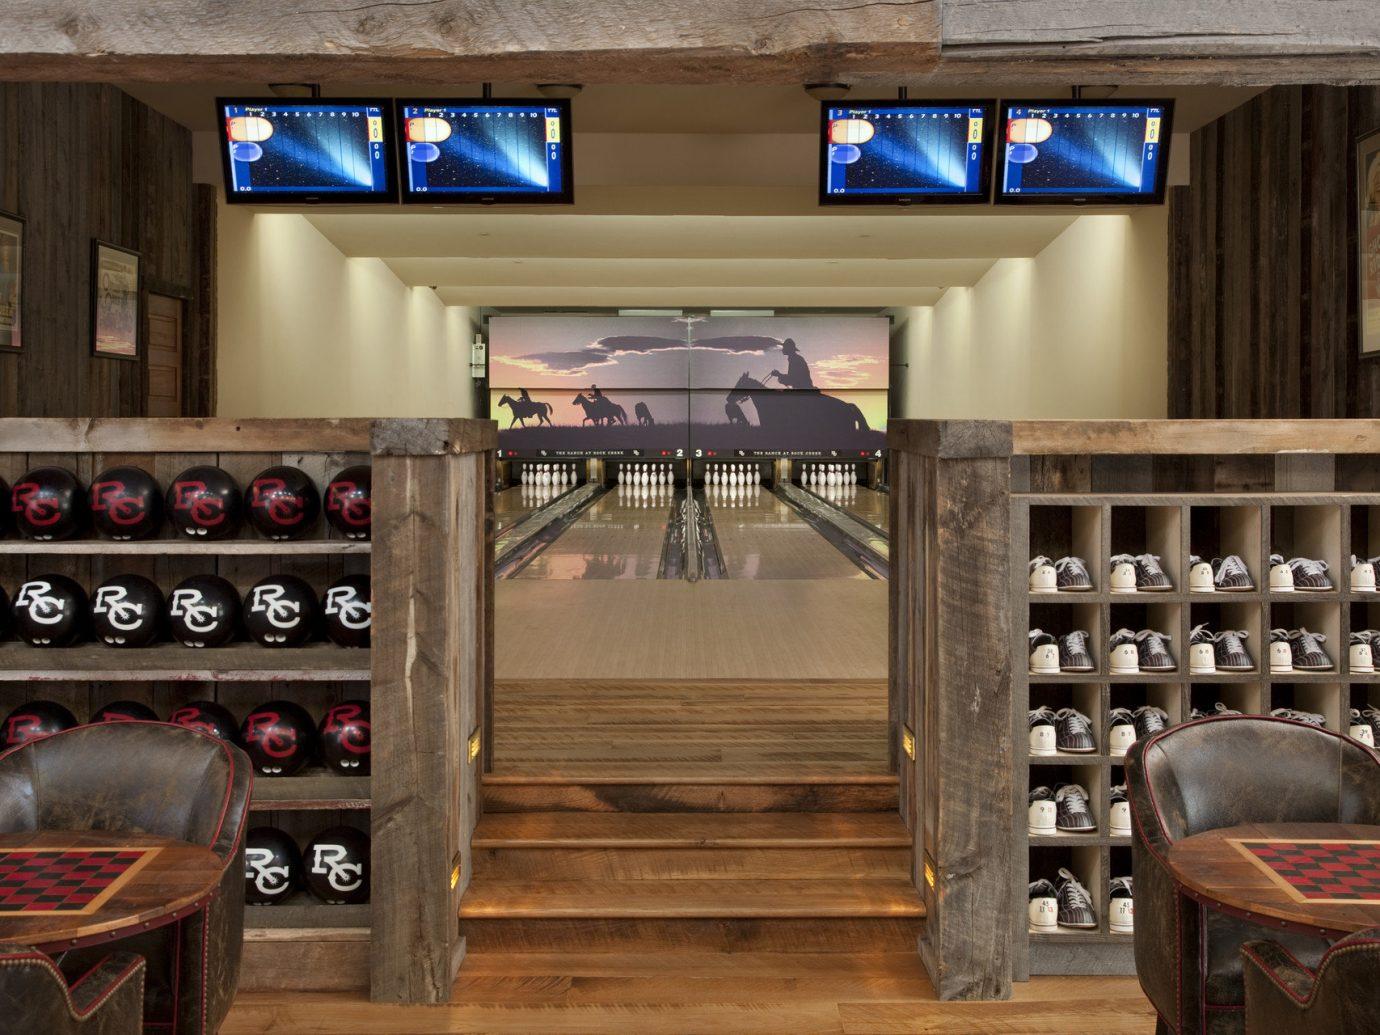 Glamping Outdoors + Adventure Weekend Getaways indoor room recreation room interior design home Bar screenshot living room set